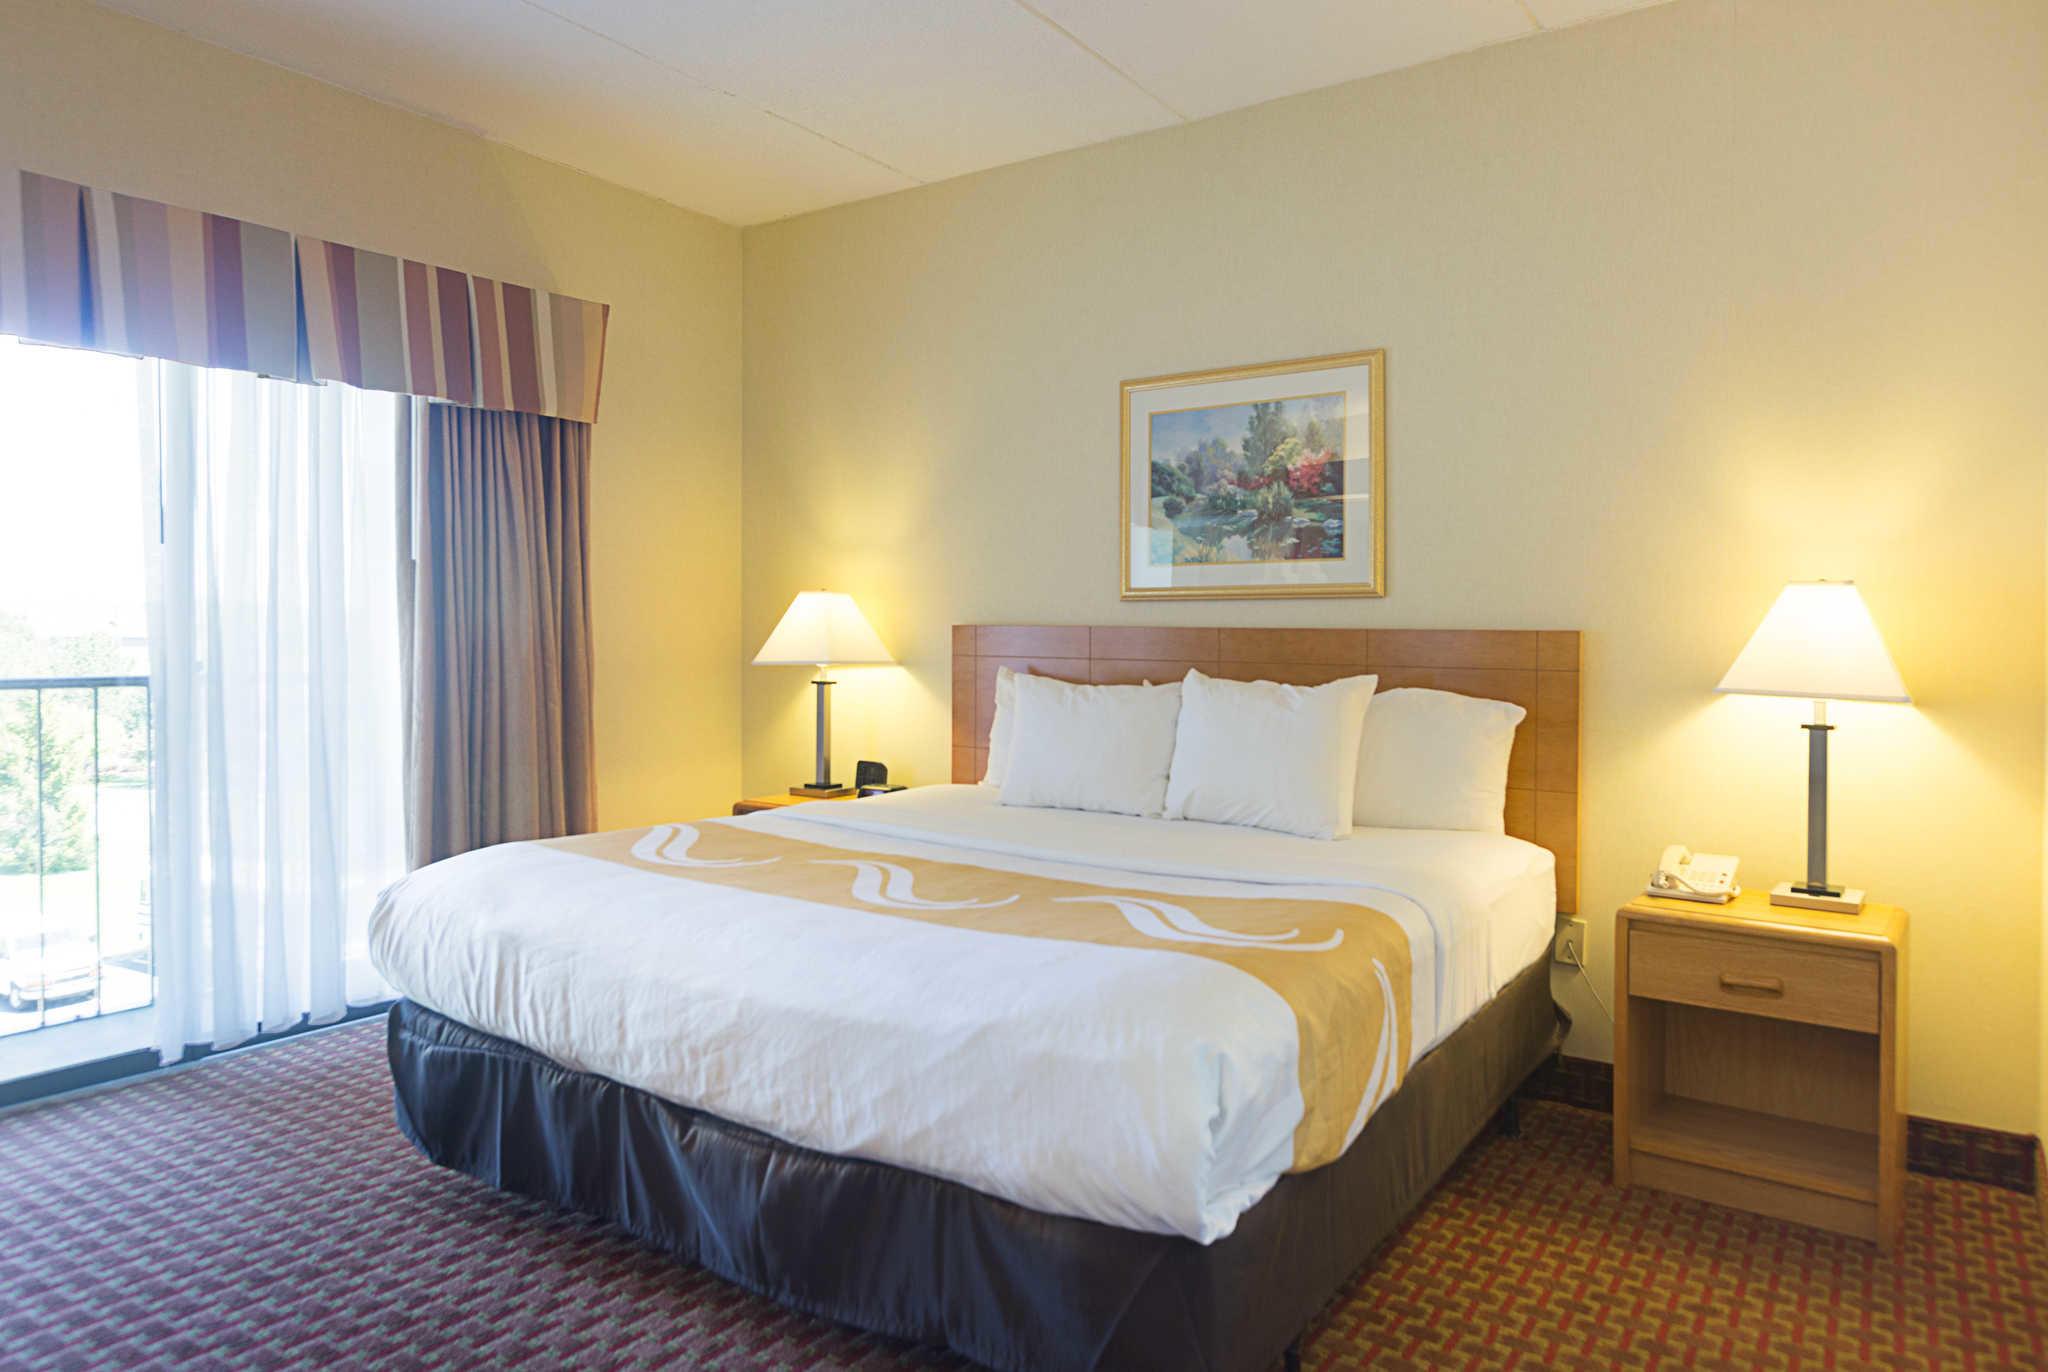 Quality Suites image 20